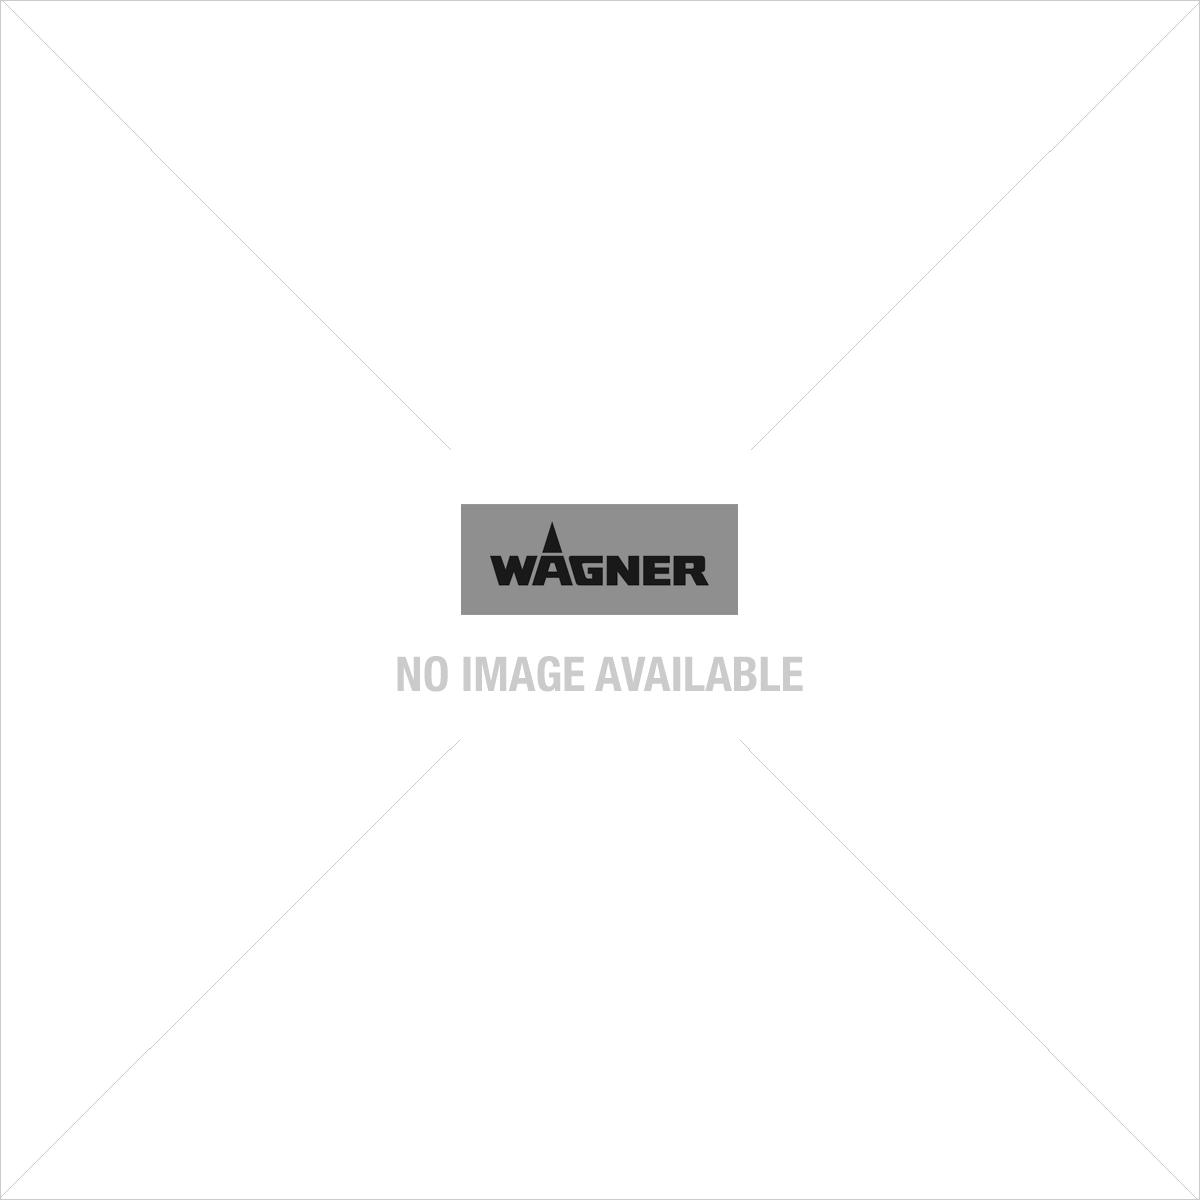 Düse M 515 Wagner airless